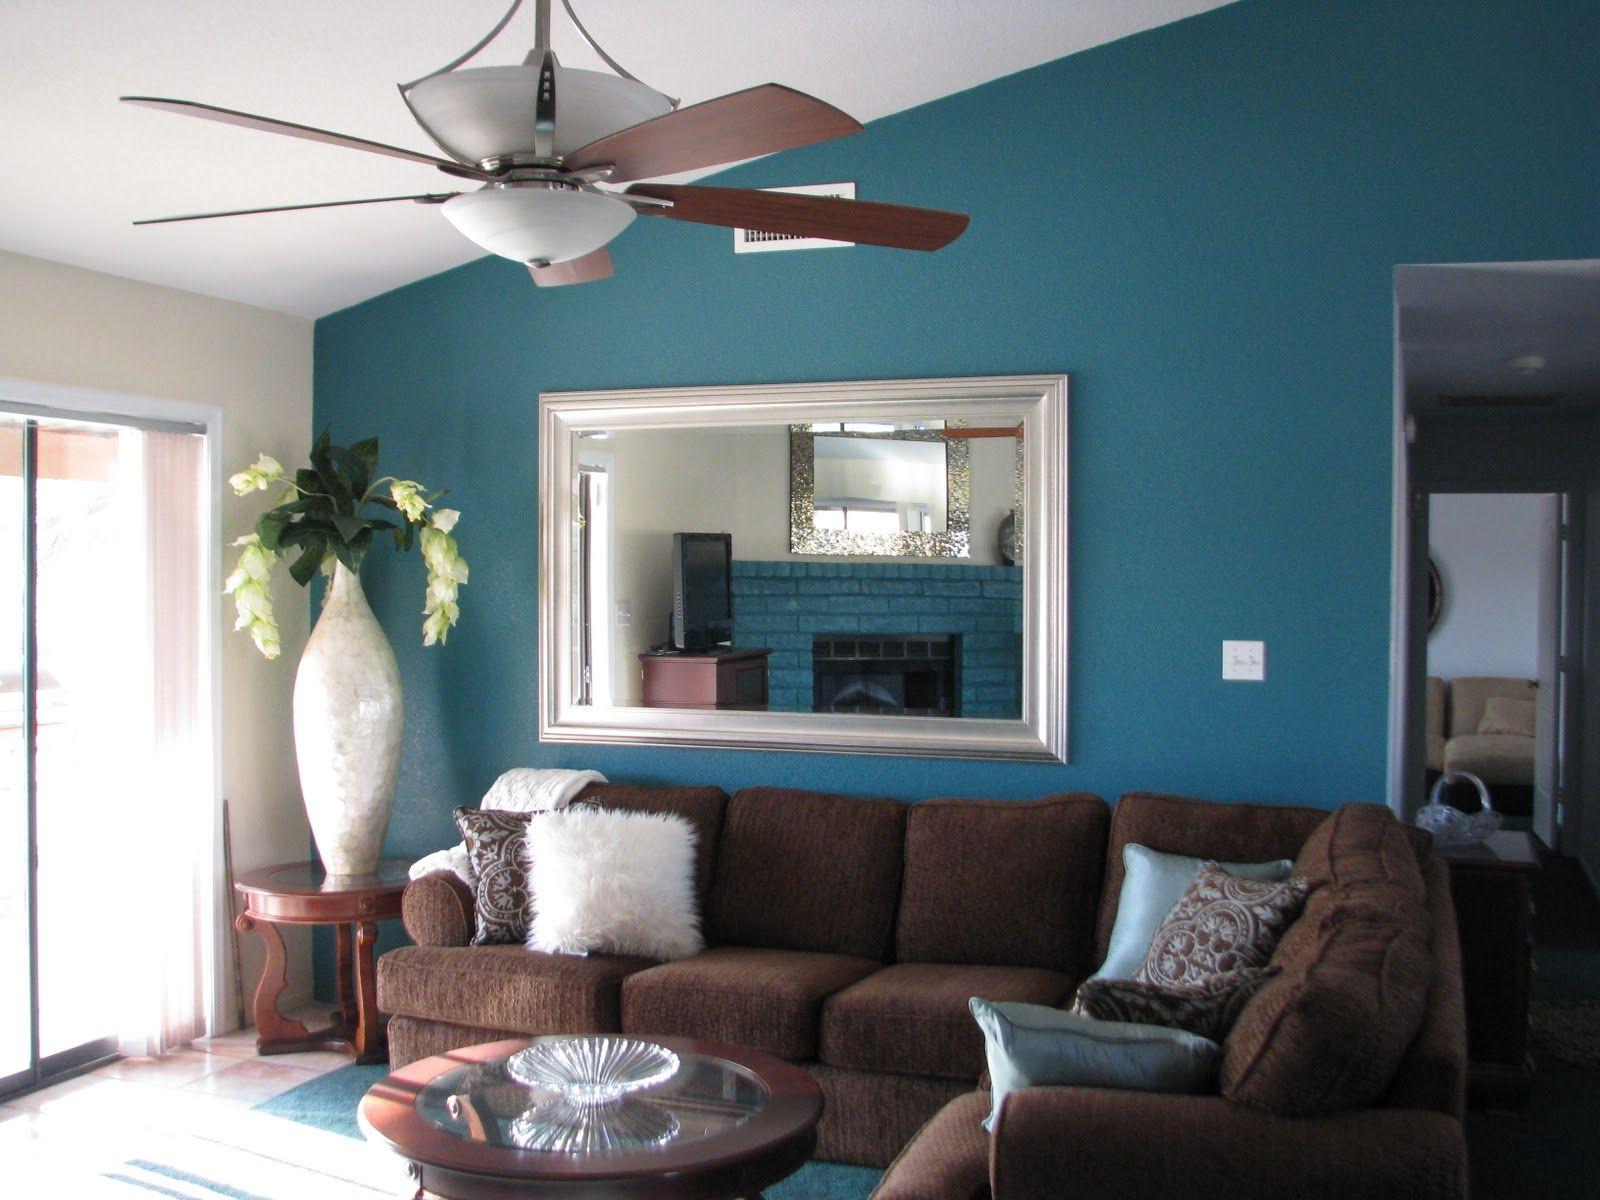 Living room with wood floor teal wall - Deep Teal Wall Color Modern Living Room Decor Ideas Brown Sofa Wood Floor Interior Design Ideas